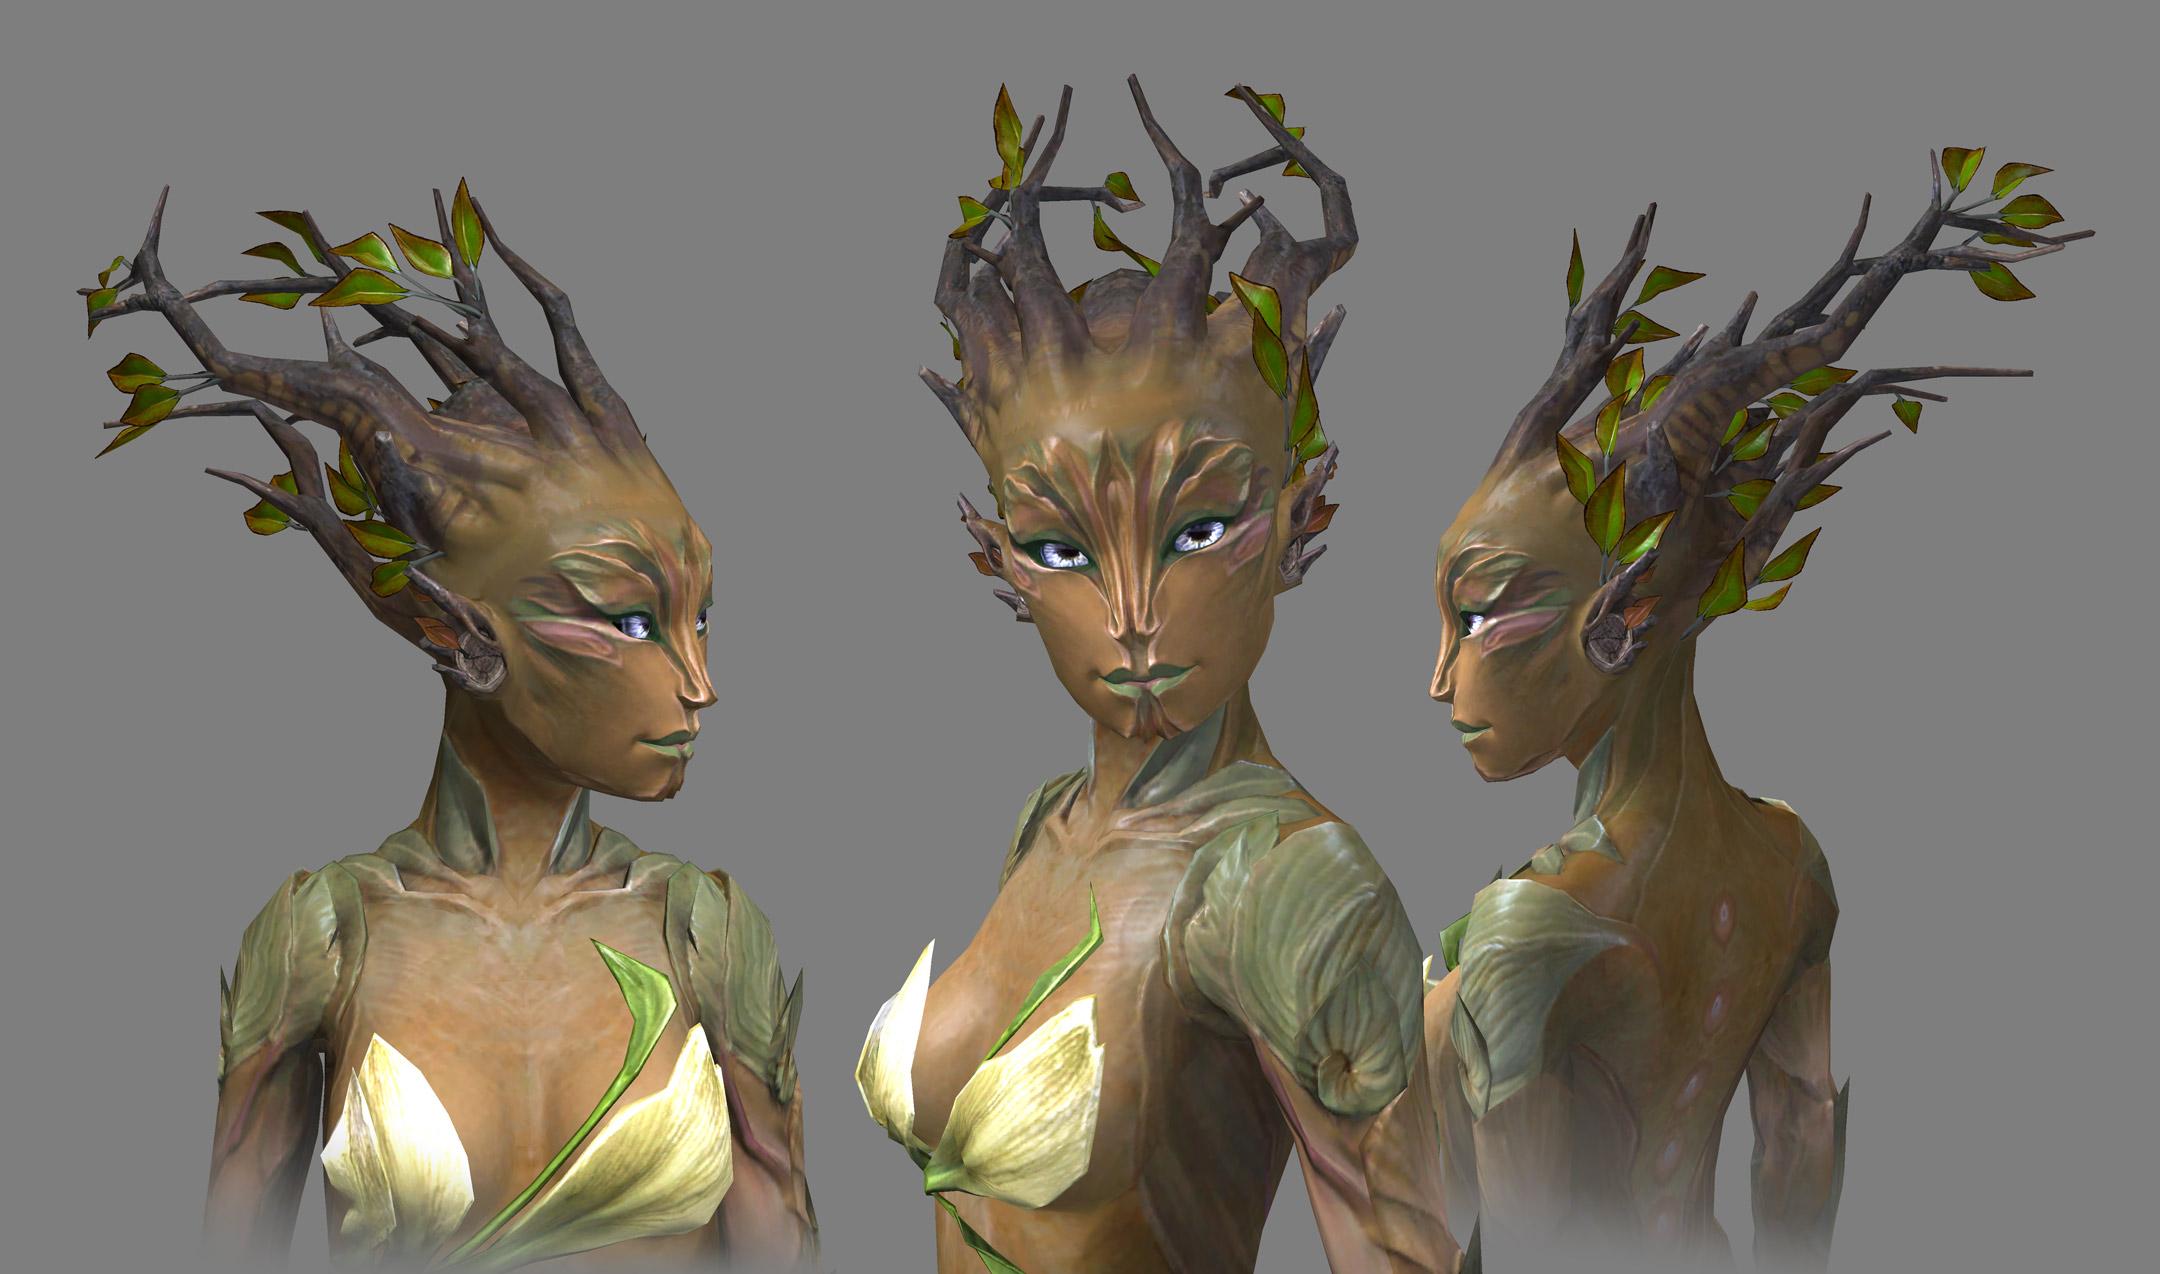 Guild Wars 2 sylvari redesign takes more plant-like